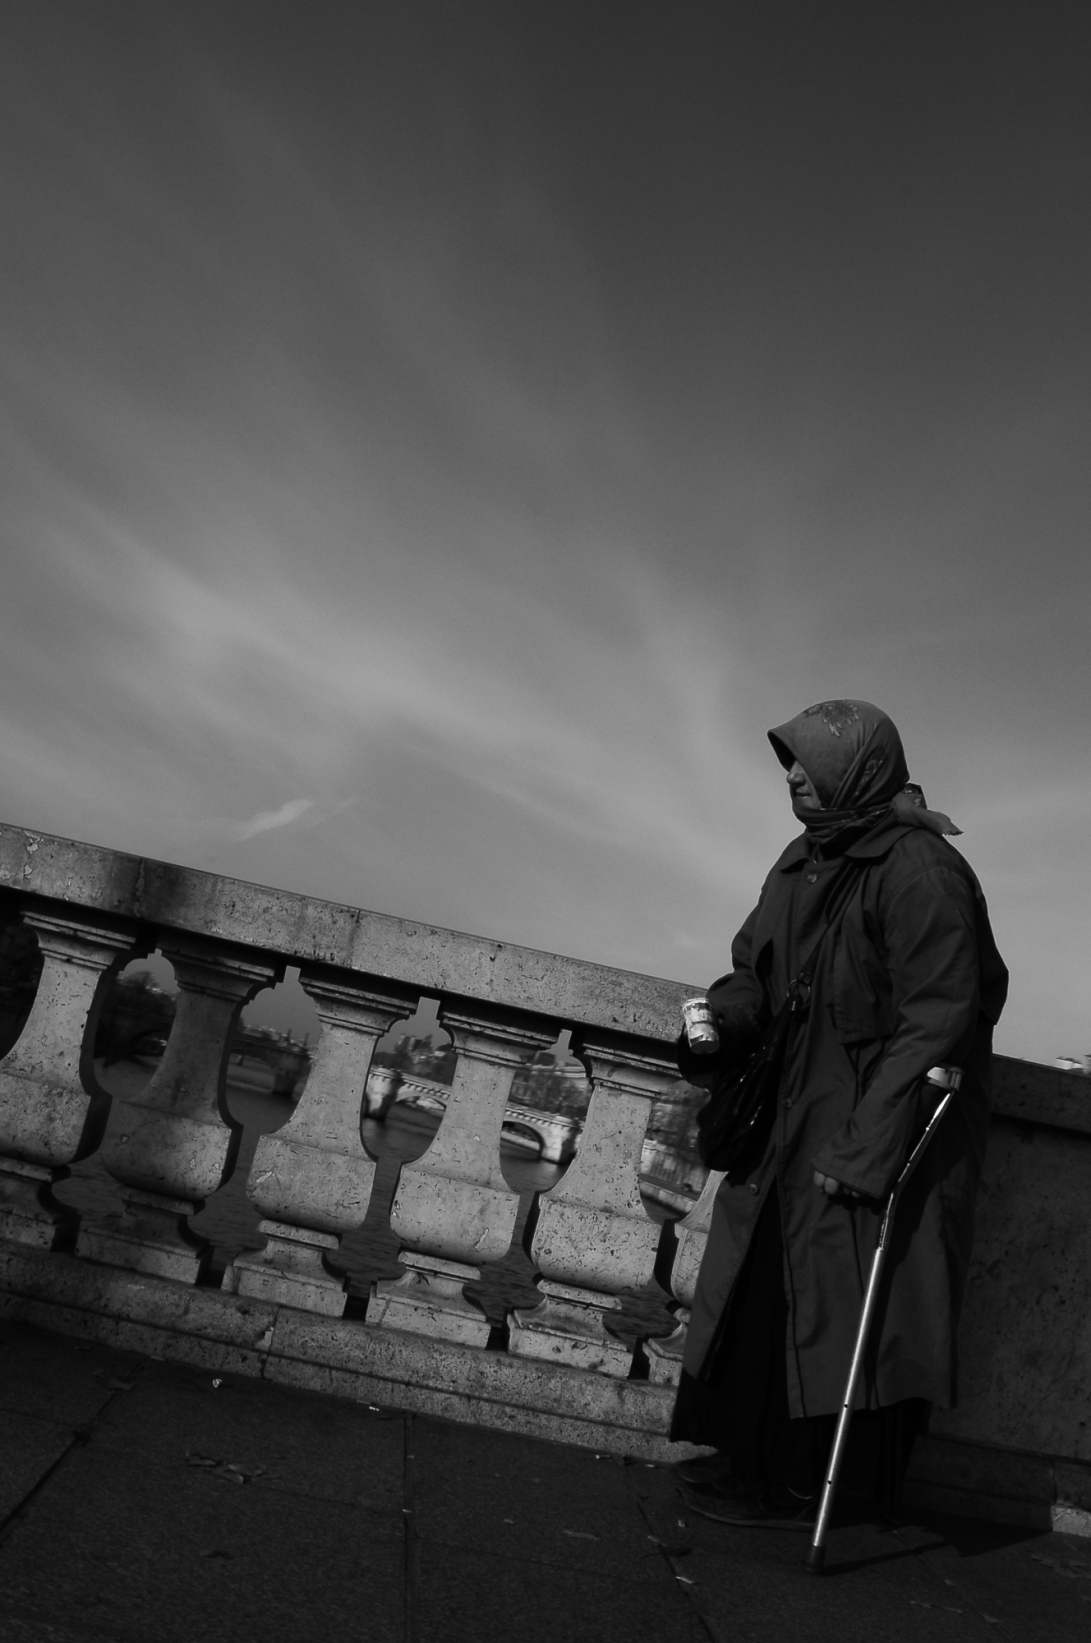 'Untruth' by Nizar M. Halloun © Attribution Non-commercial Share Alike